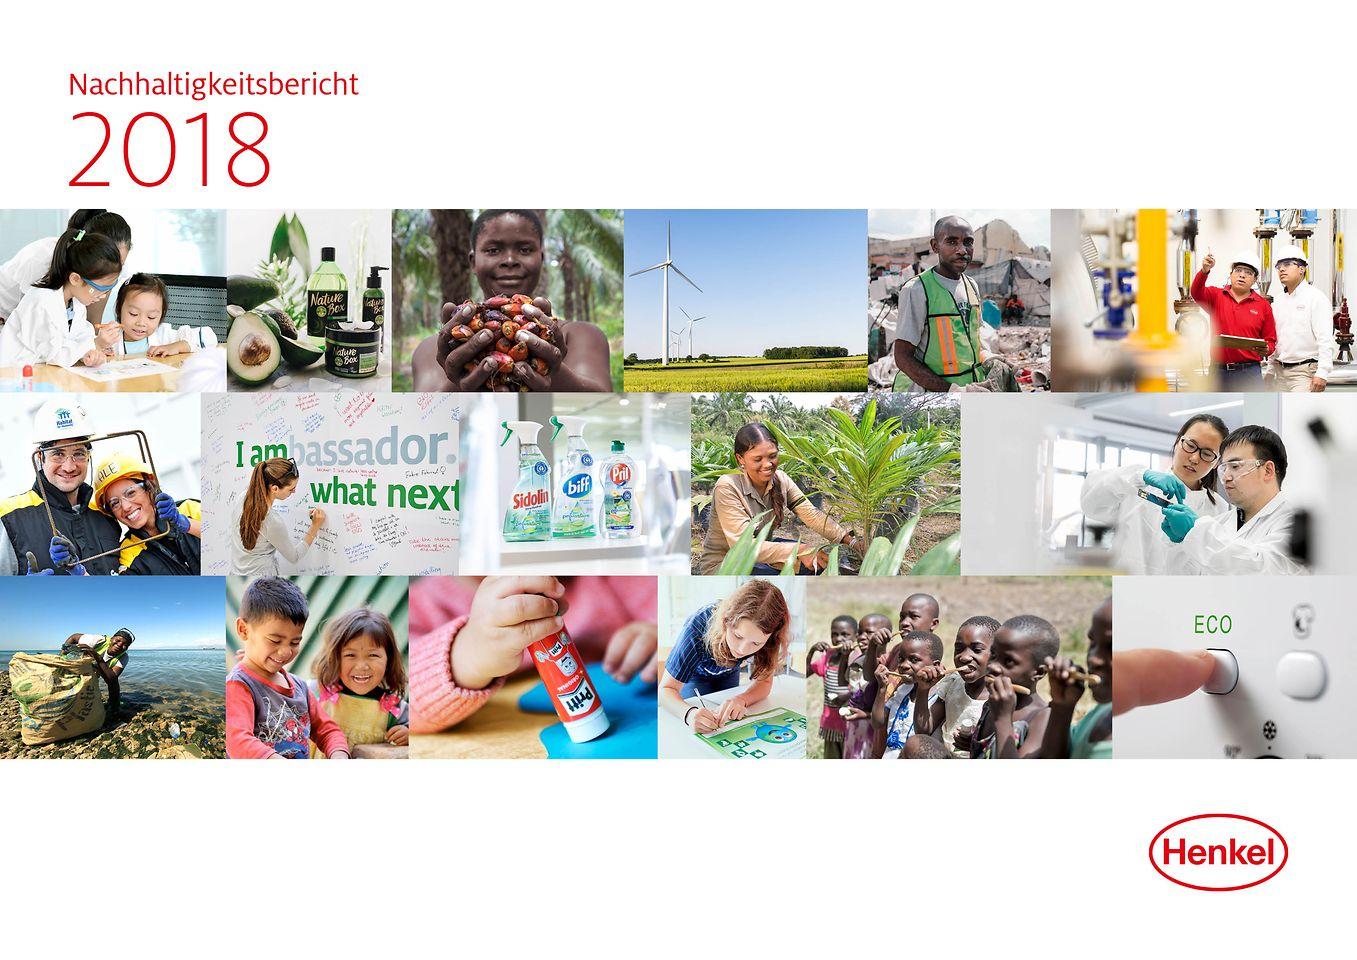 2018 Nachhaltigkeitsbericht Cover